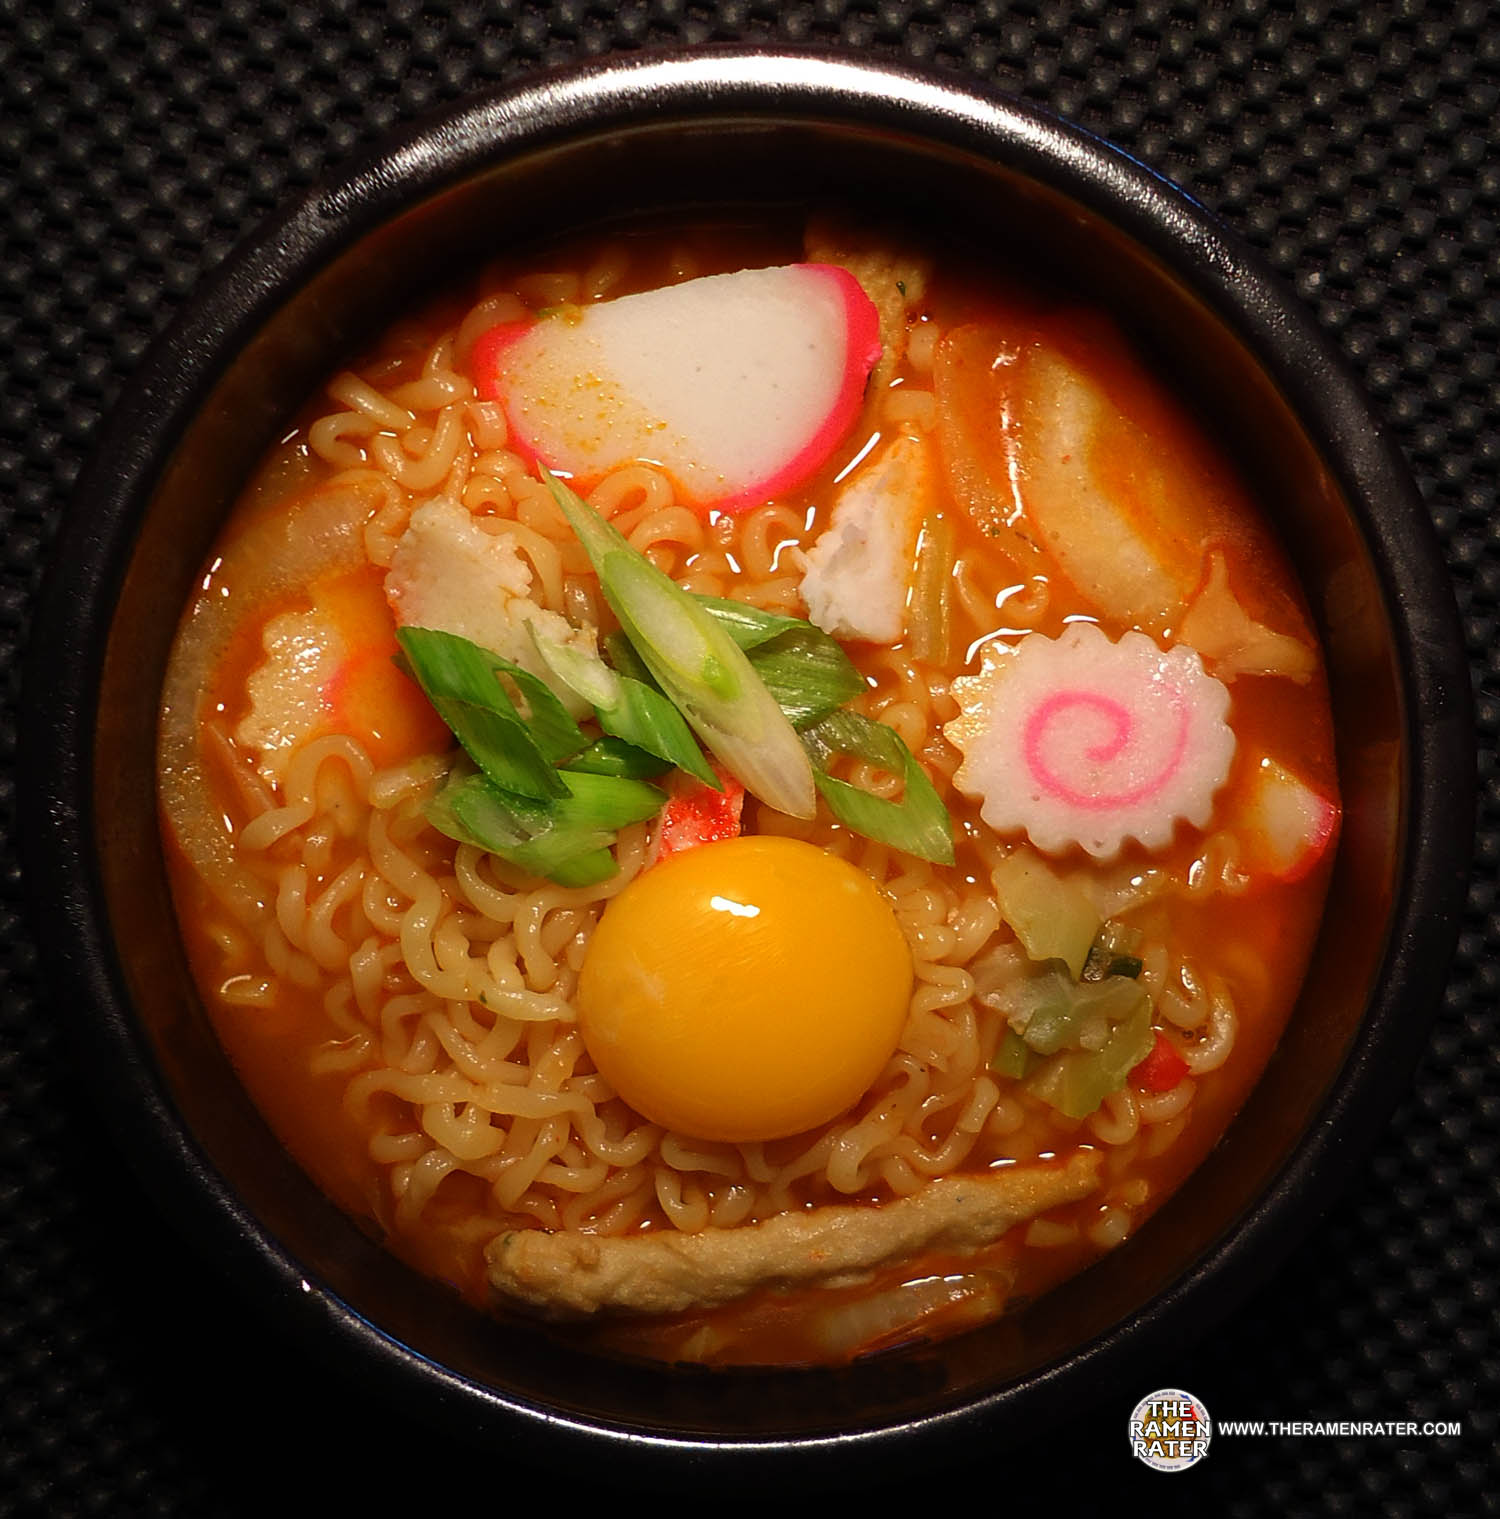 1300 Samyang Foods Red Nagasaki Jjampong The Ramen Rater